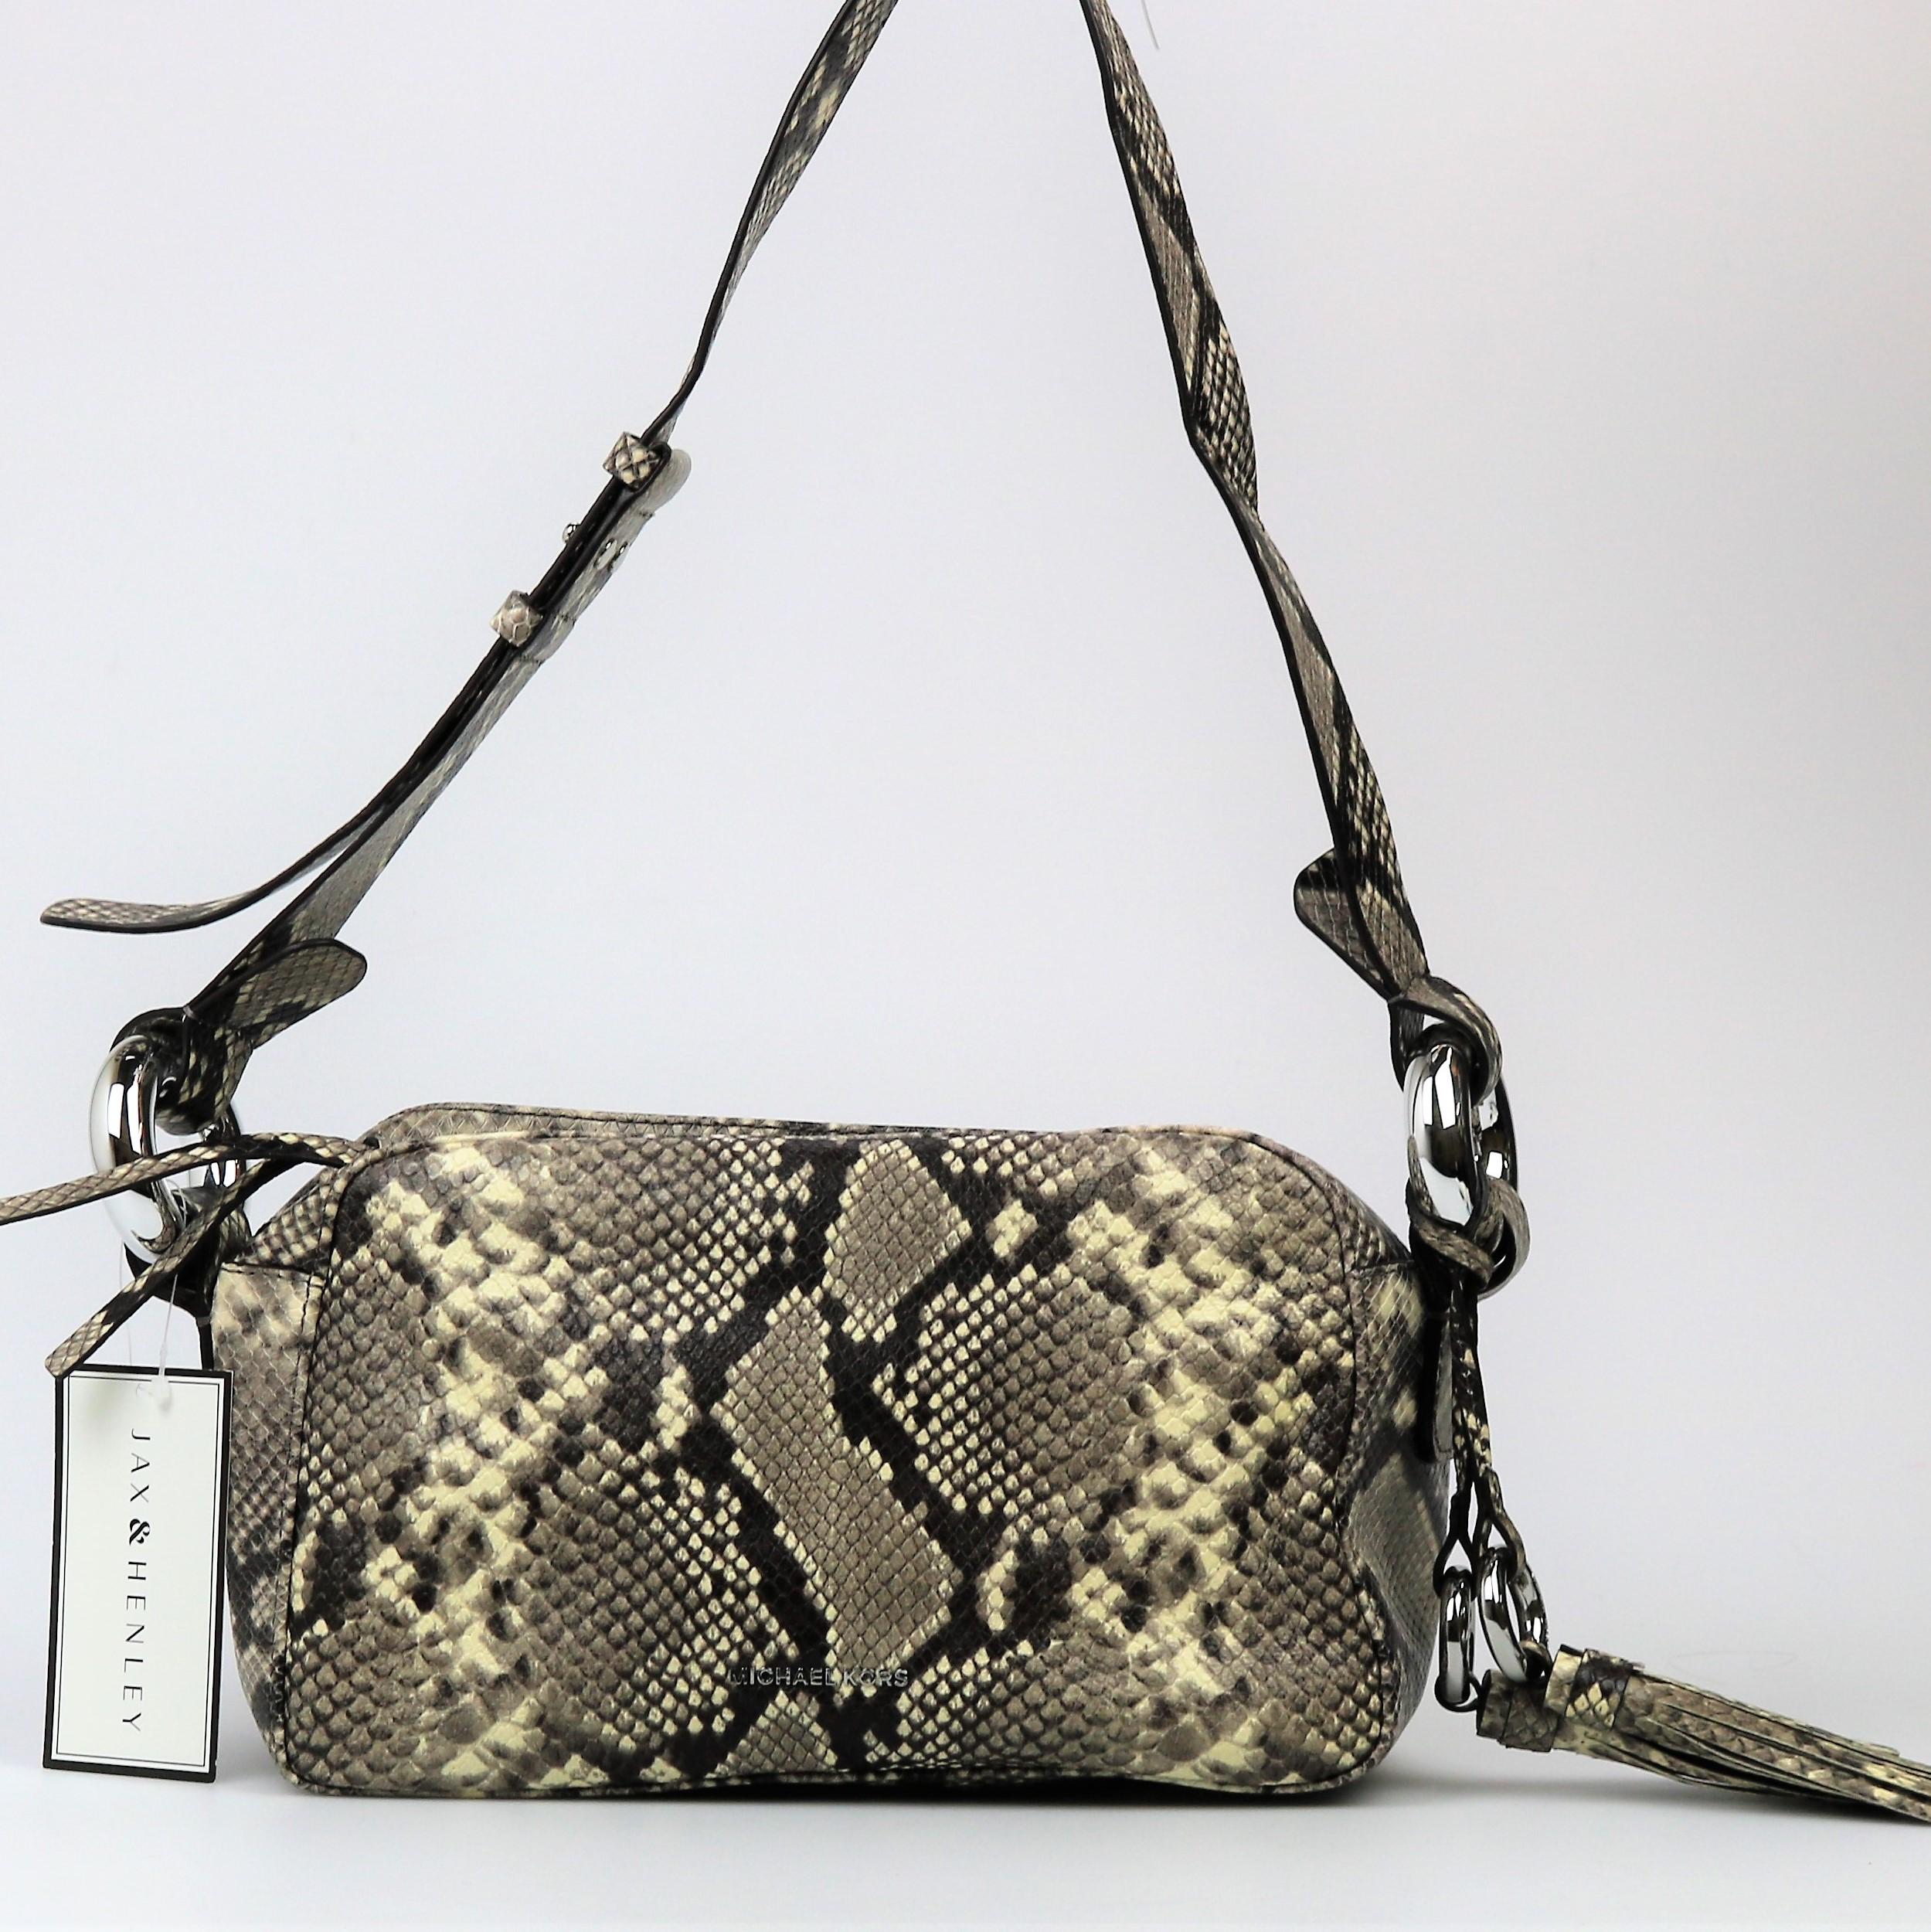 0c8bf8f0f8d6 Michael Kors Python Medium Shoulder Bag leather 190864494425 | eBay